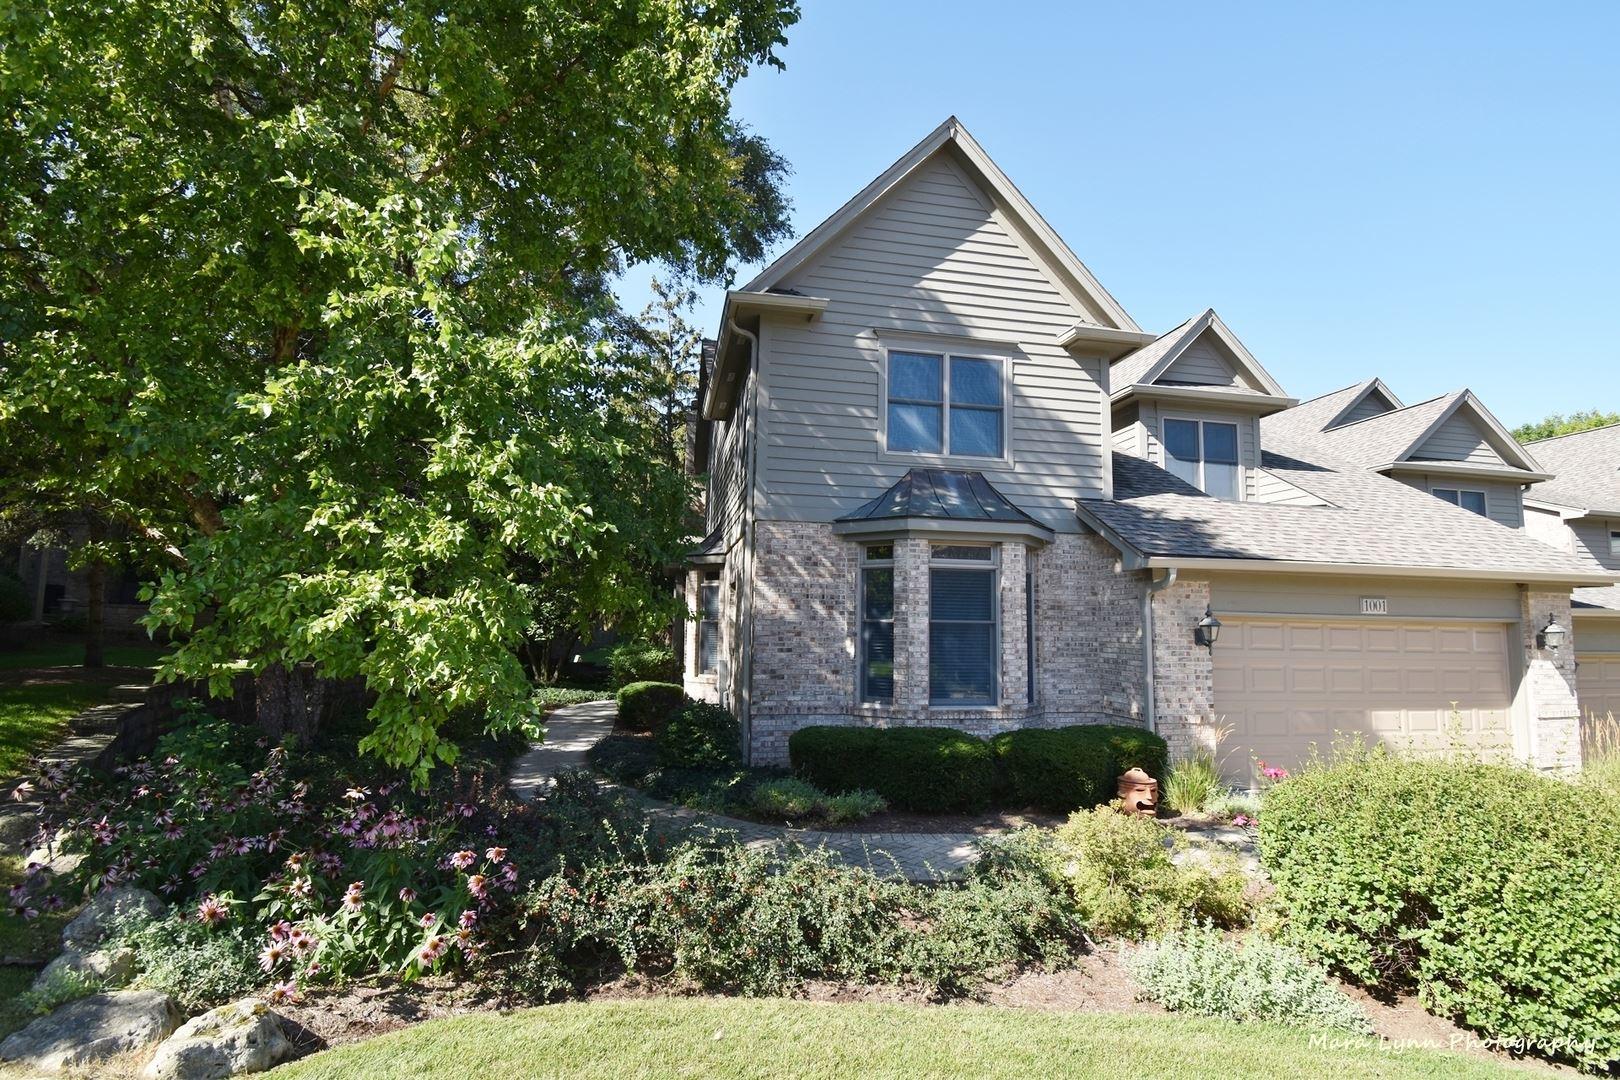 1001 Crestwood Circle #1001, Saint Charles, IL 60175 - MLS#: 11205326